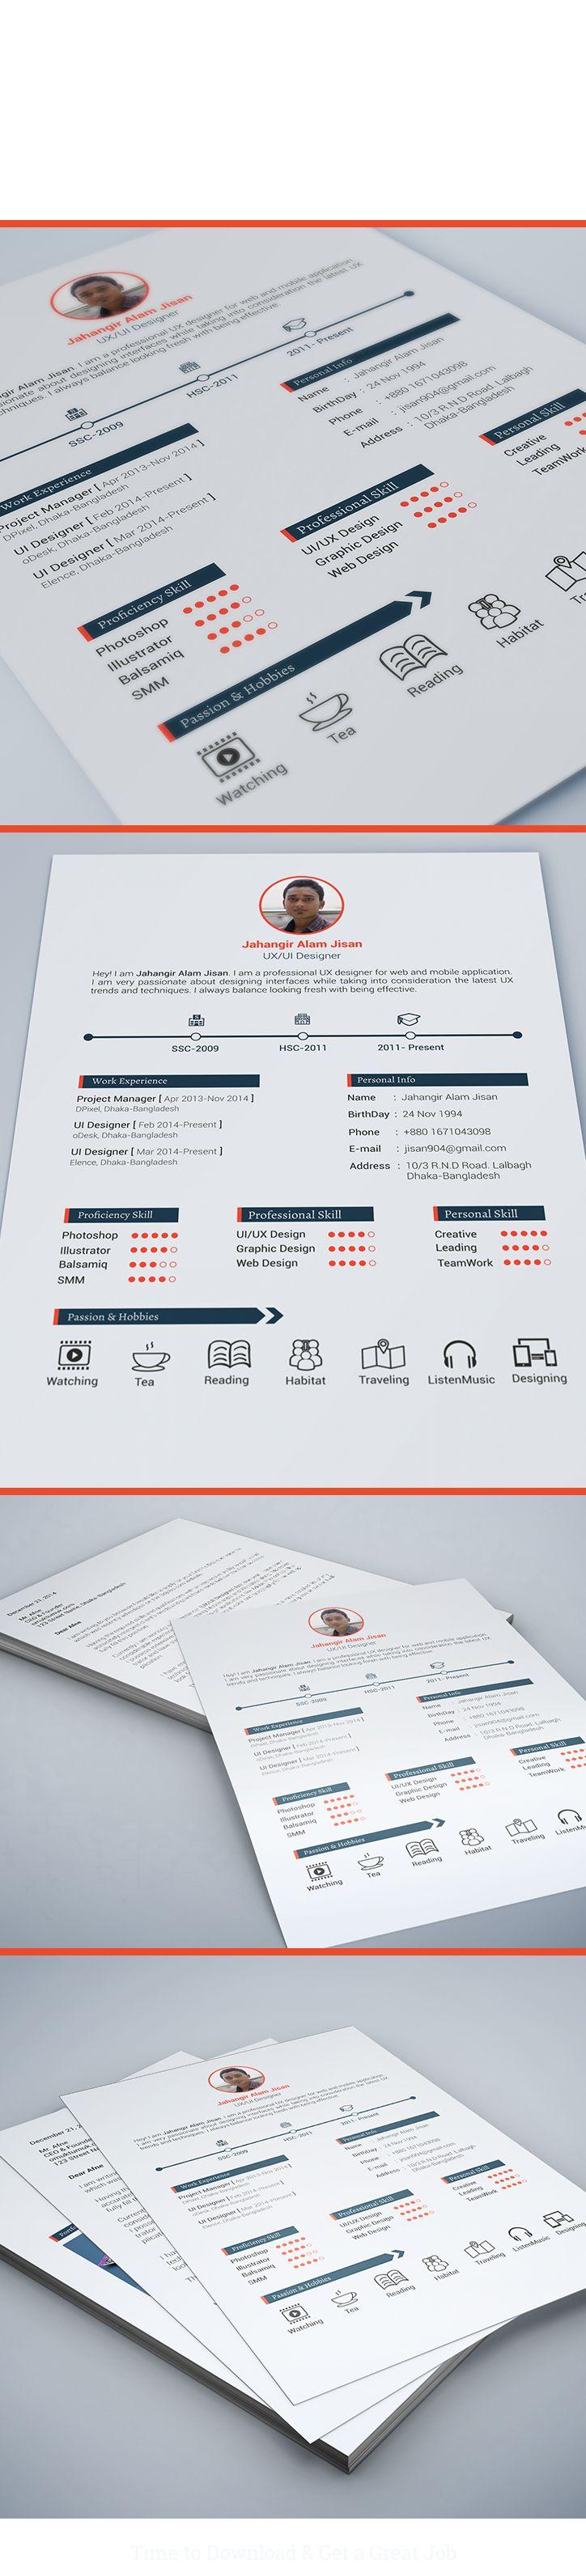 40 best resume images on pinterest resume design design resume